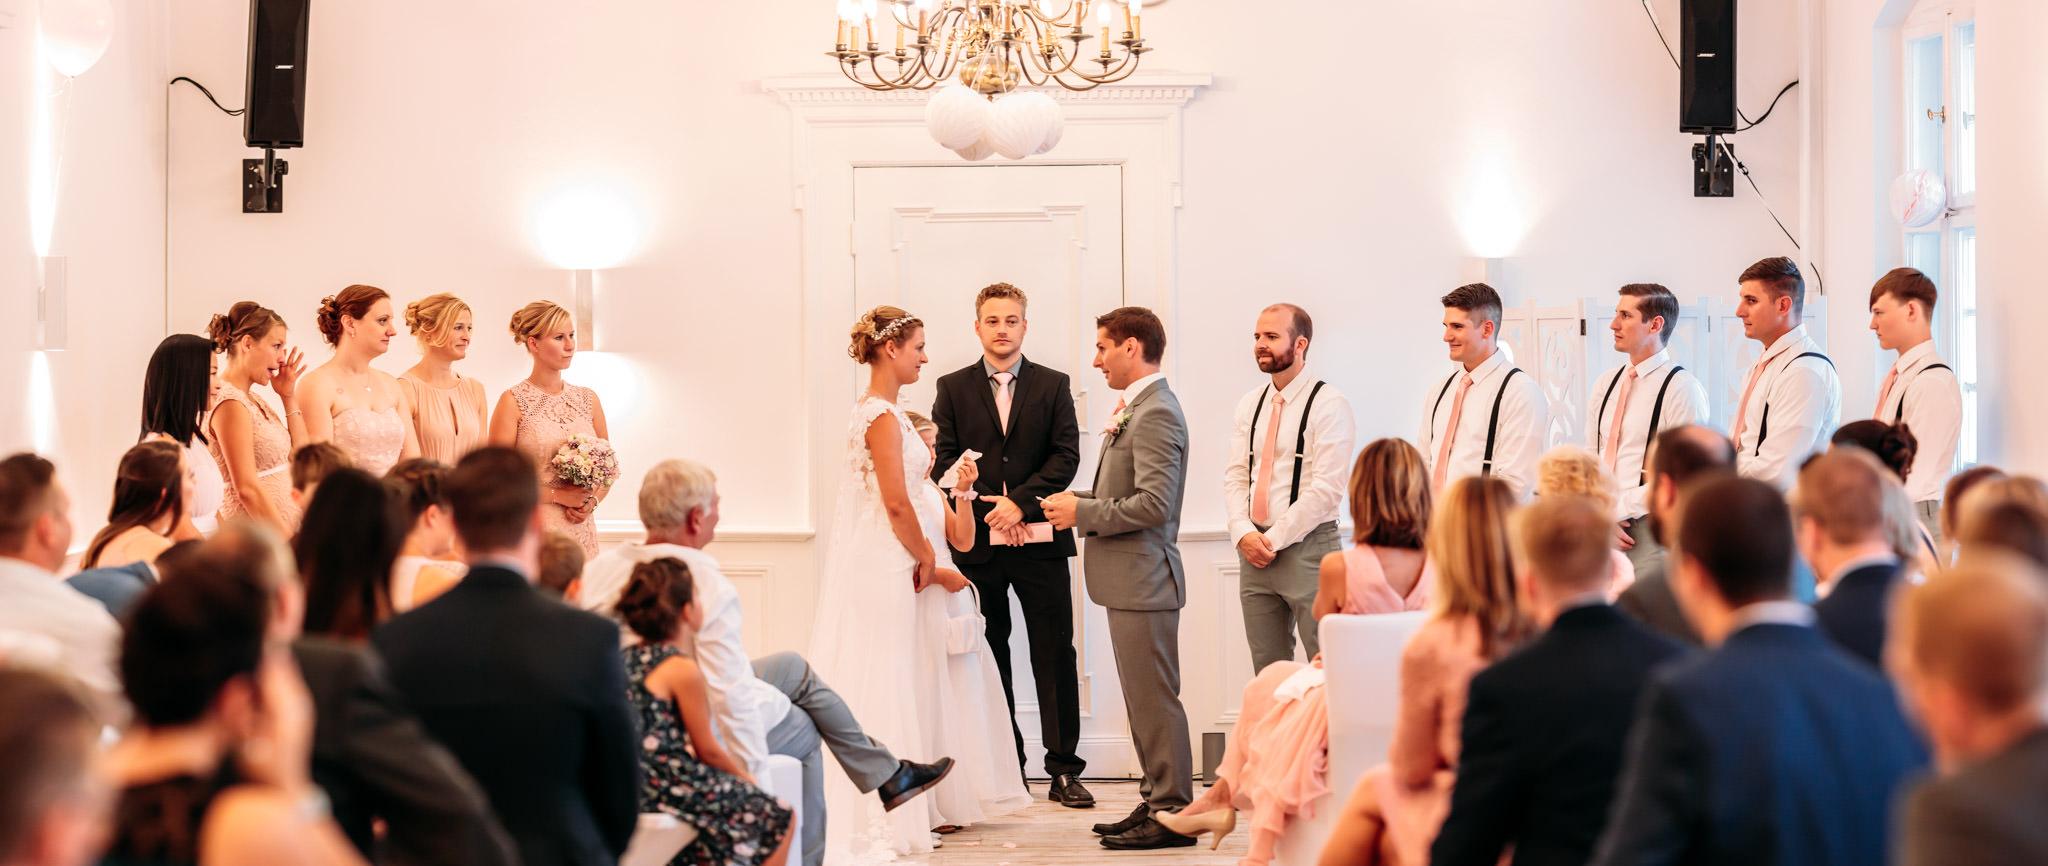 180818_Hochzeit_german_american_grunewald_berlin_locanda_12_apostoli_wedding_web_0008.jpg